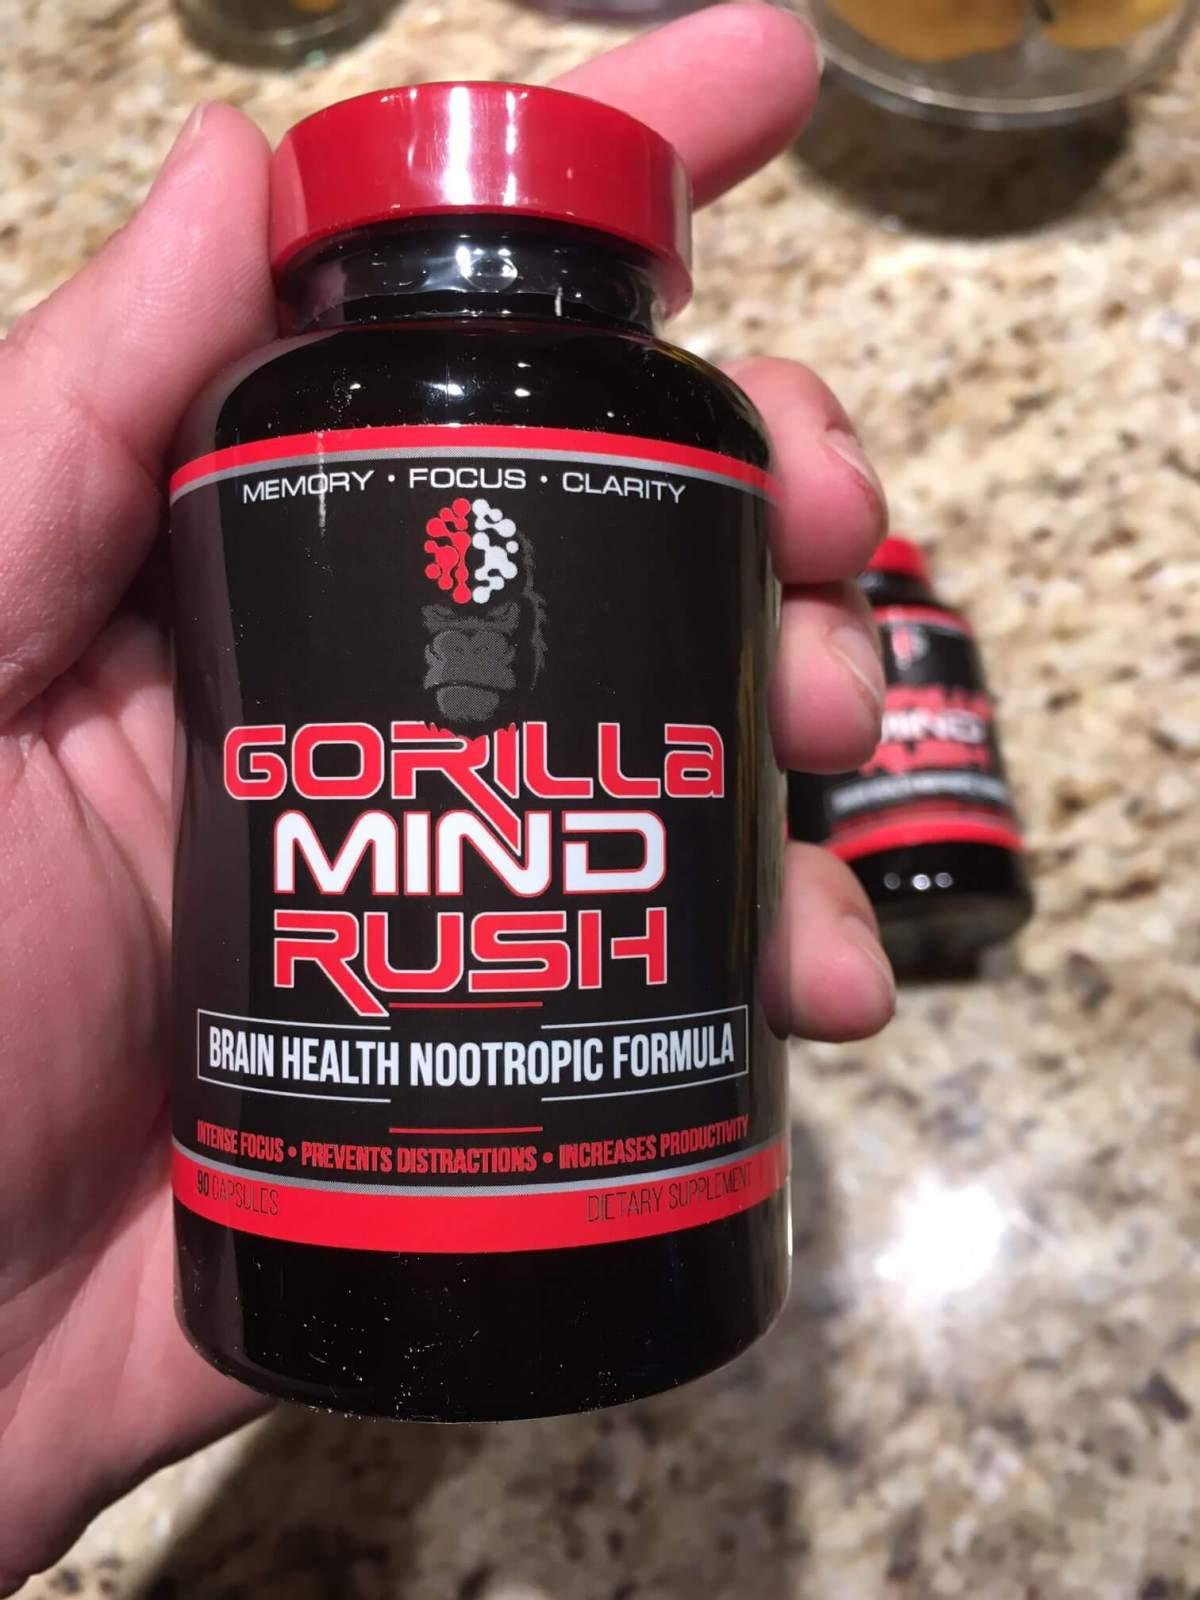 Left hand holding Gorilla Mind Rush Supplement